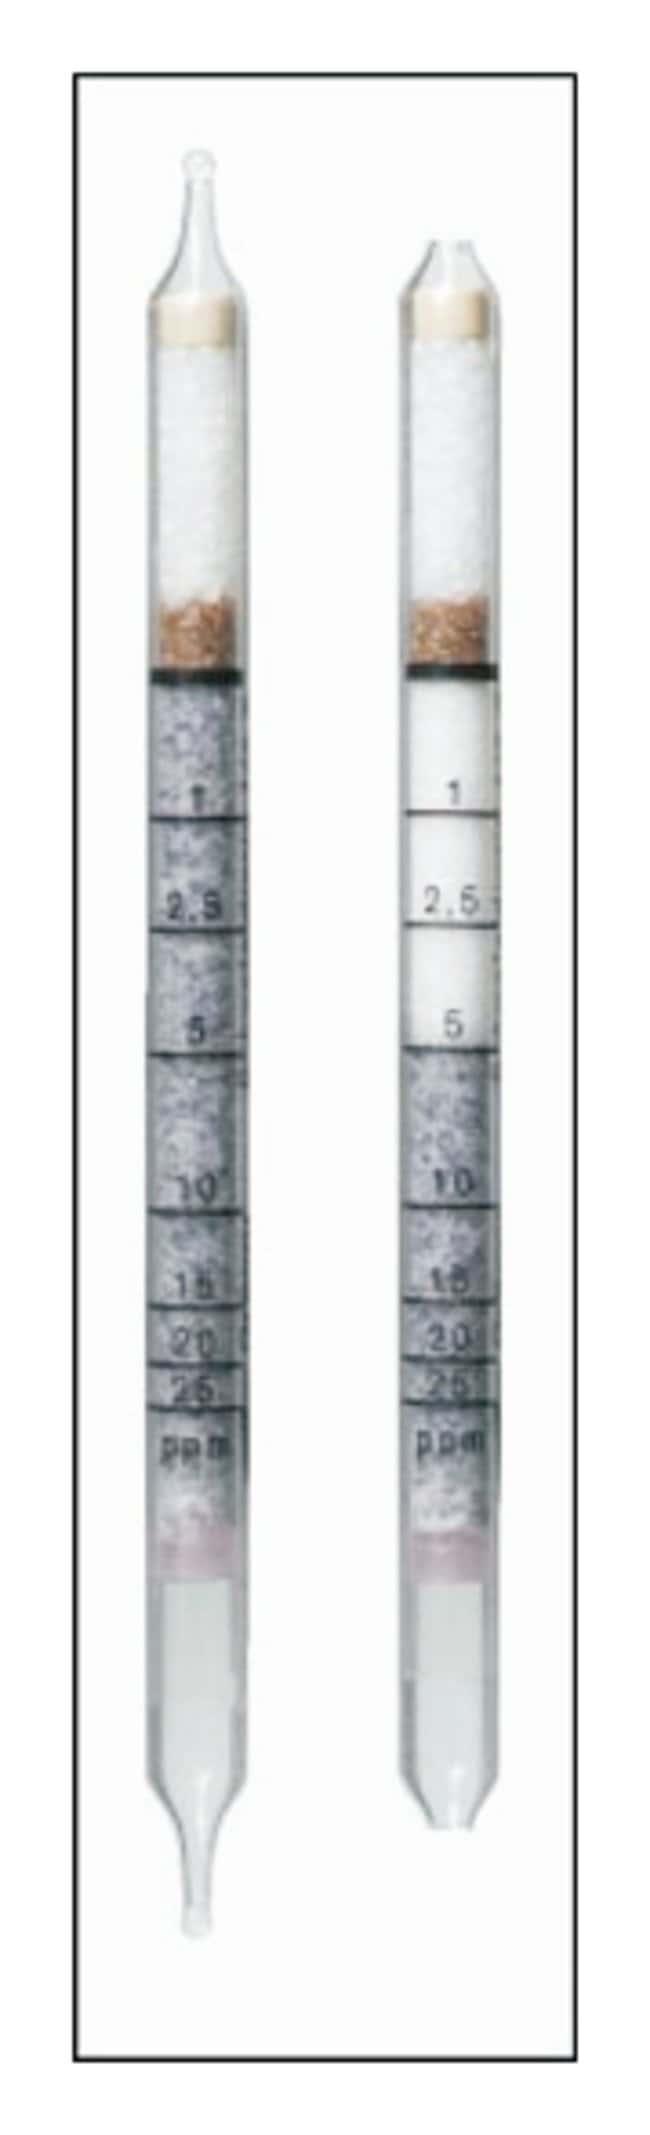 Dräger™Short-Term Detector Tubes: Sulfur Dioxide